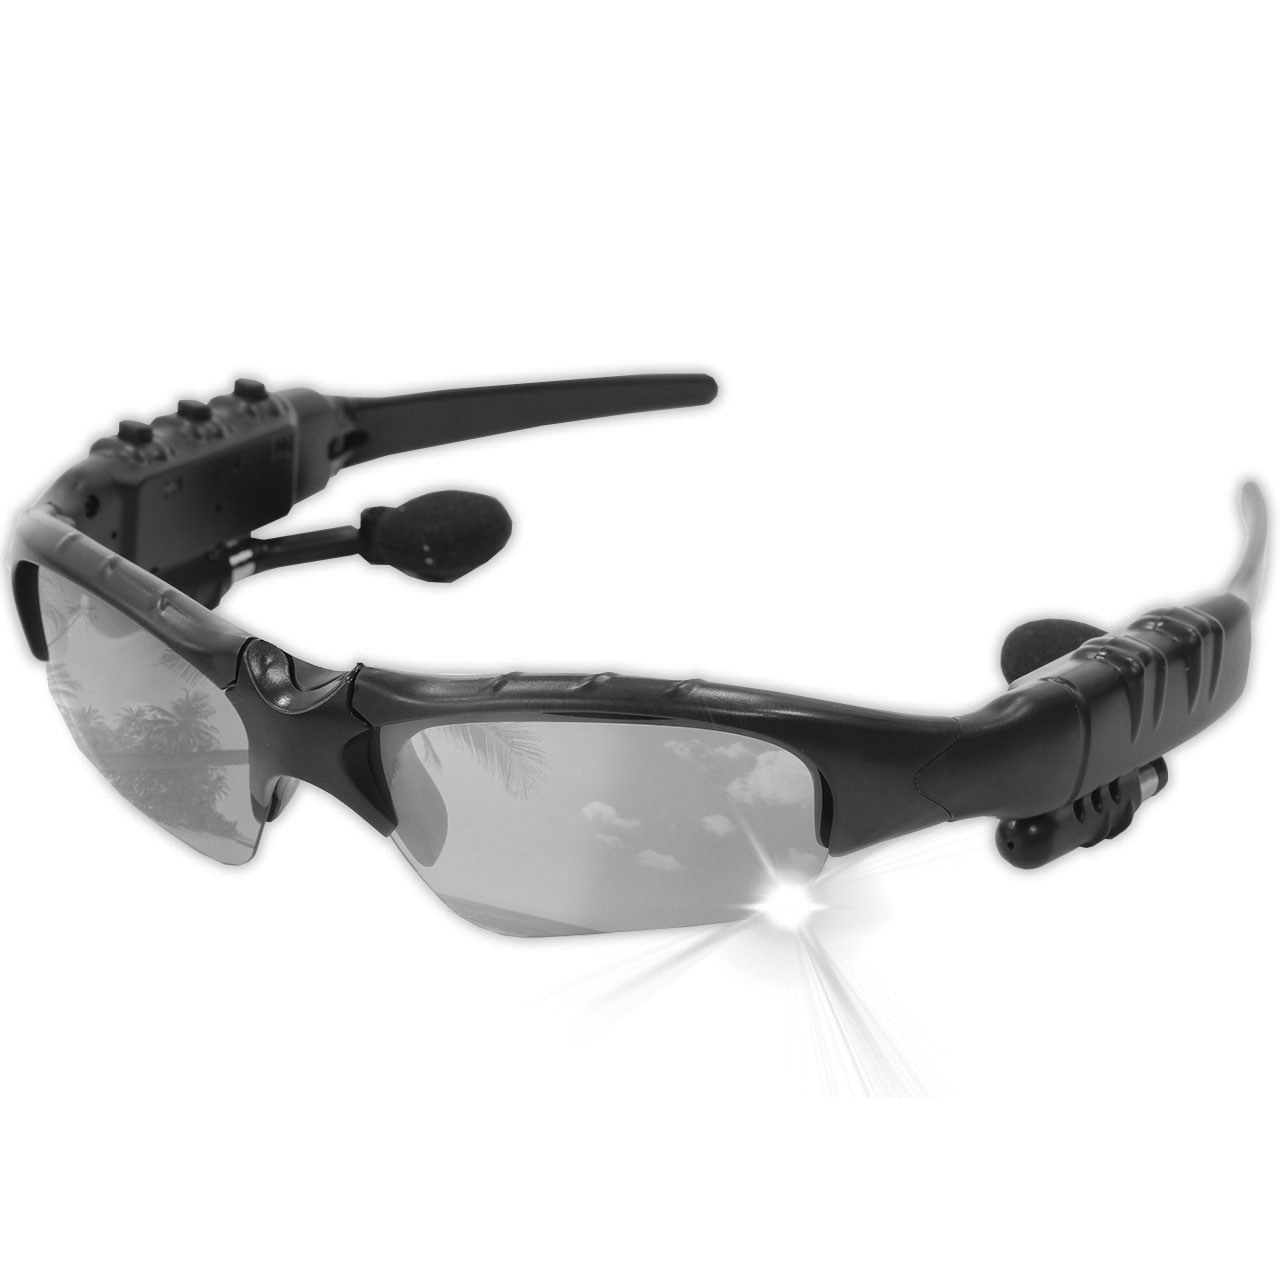 Bluetooth окуляри з навушниками і мікрофоном Sunglasses LK-086 Black (1156-6041)